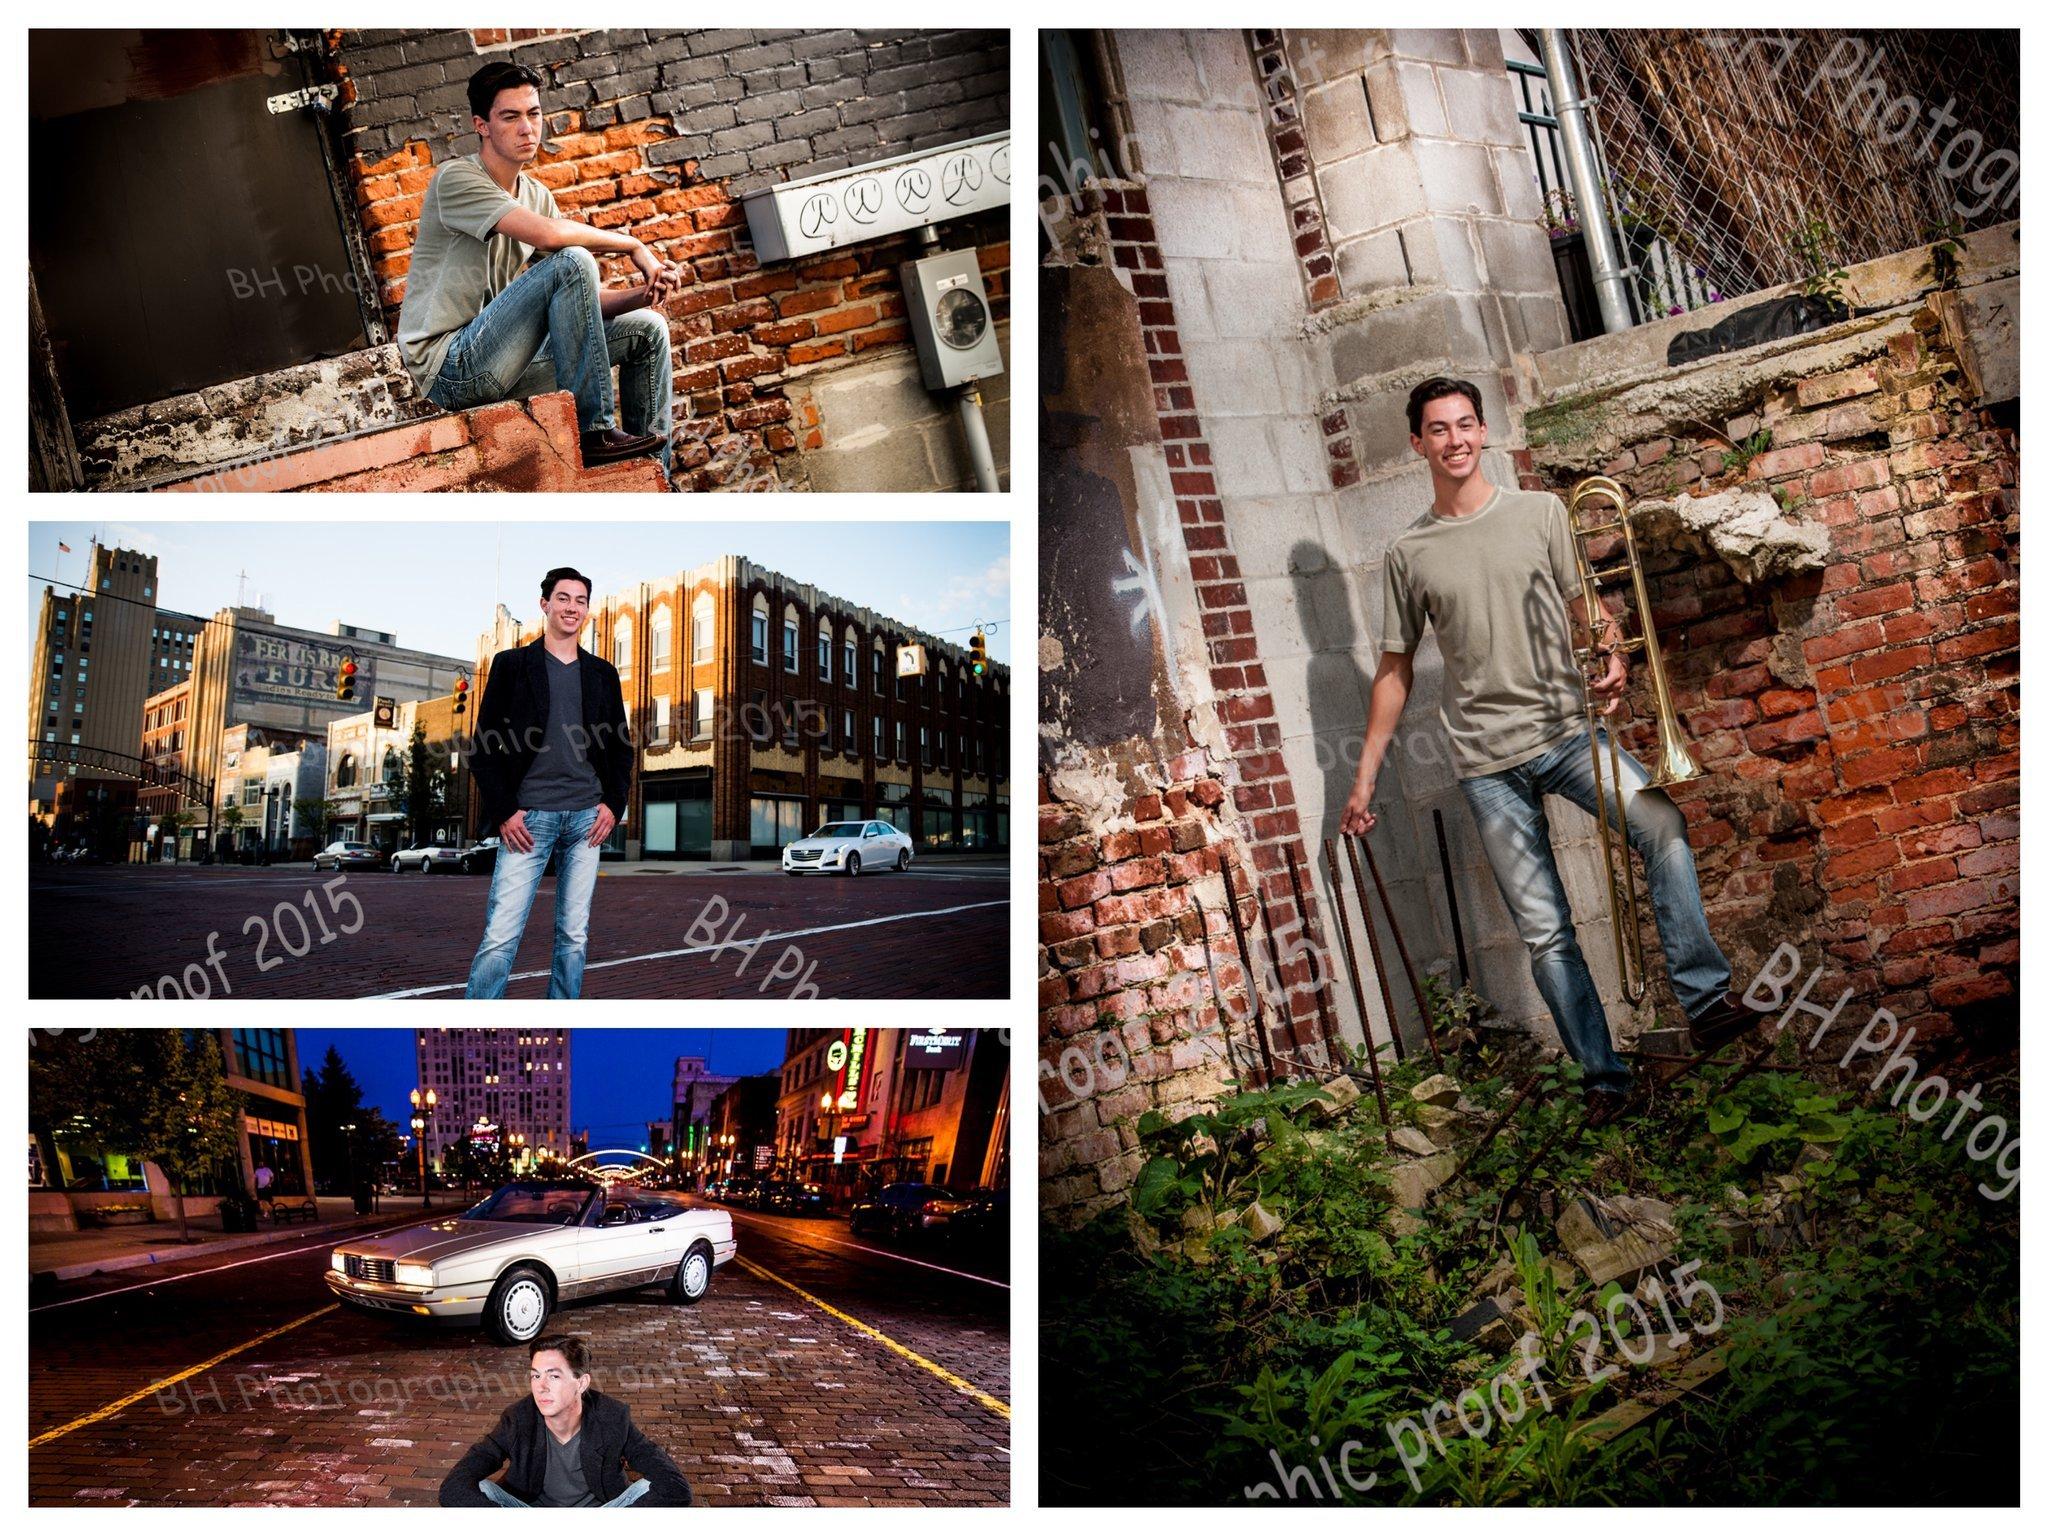 BH3_5998_Fotor_Collage 3.jpg